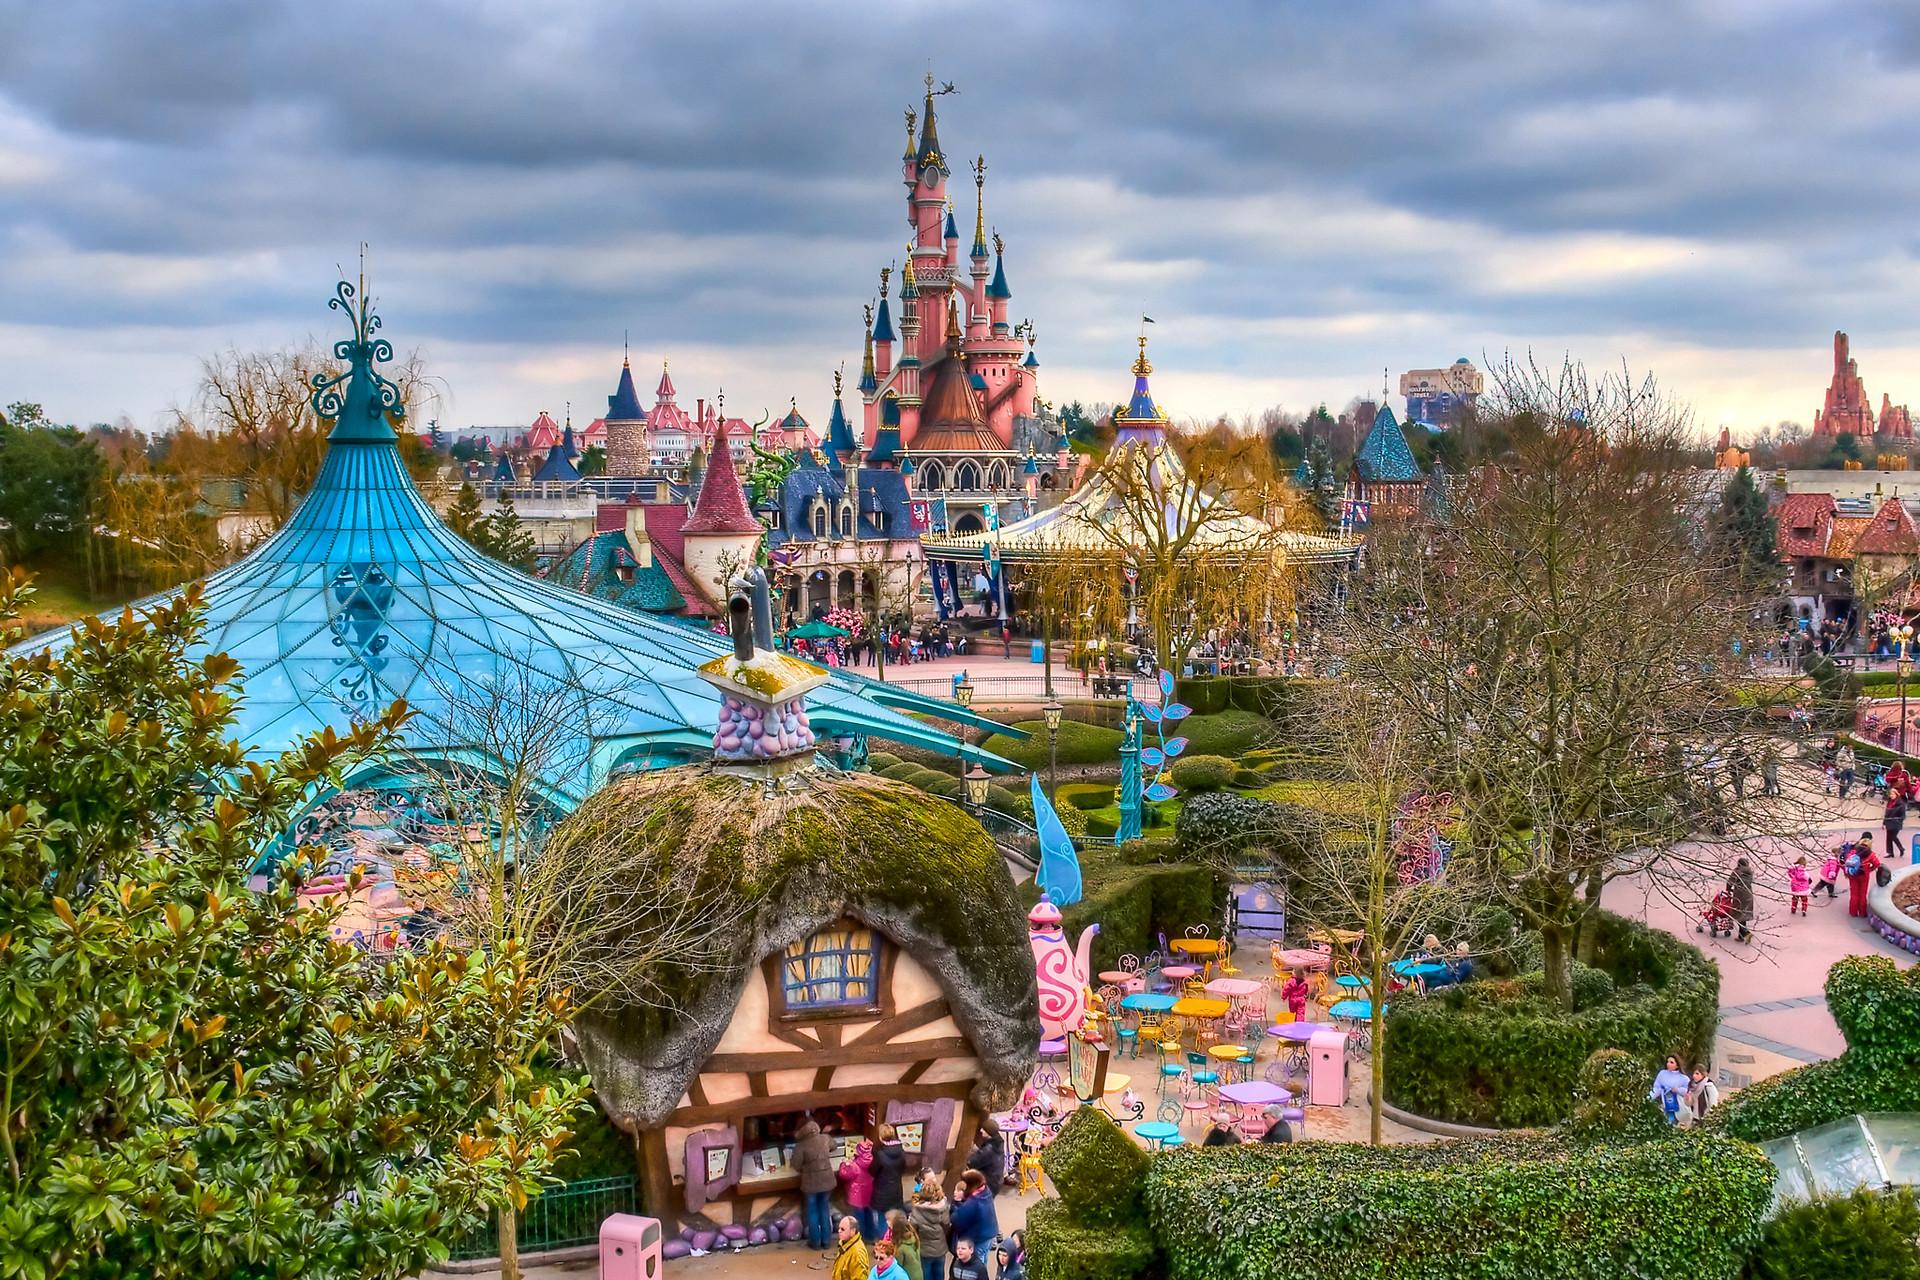 Disneyland Paris: Main Park